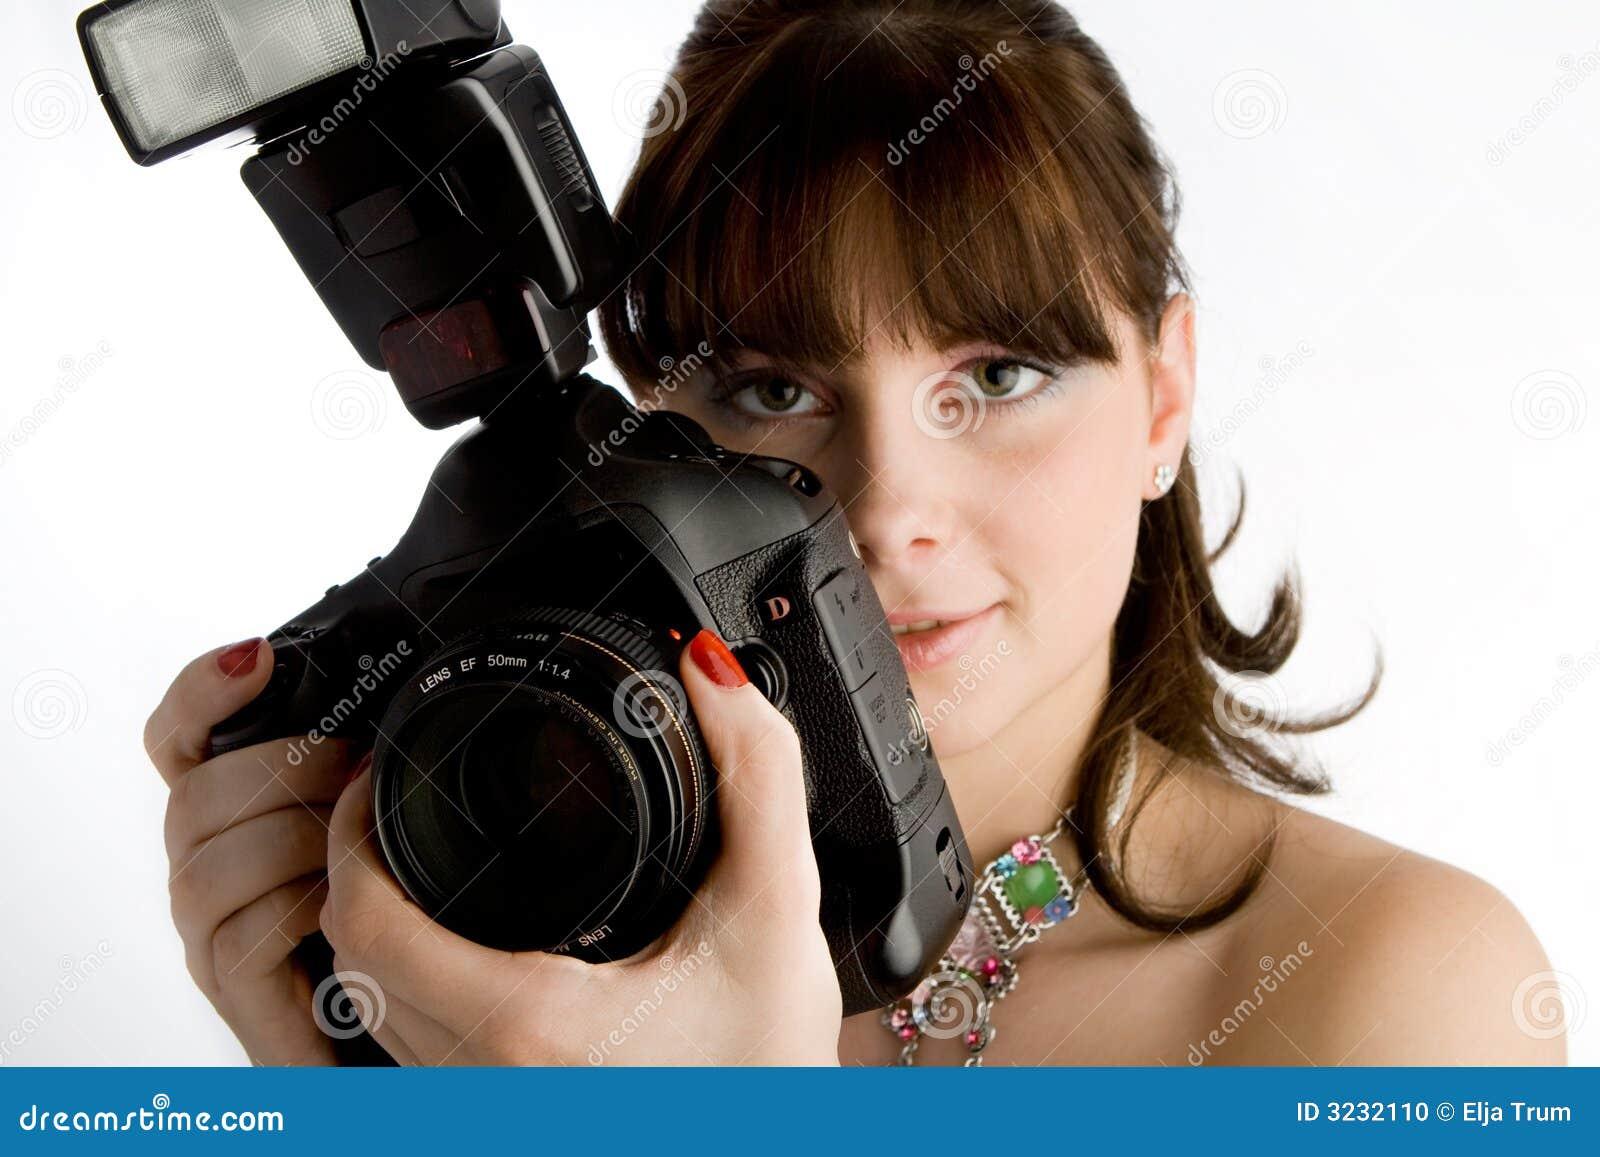 appareil photo fille